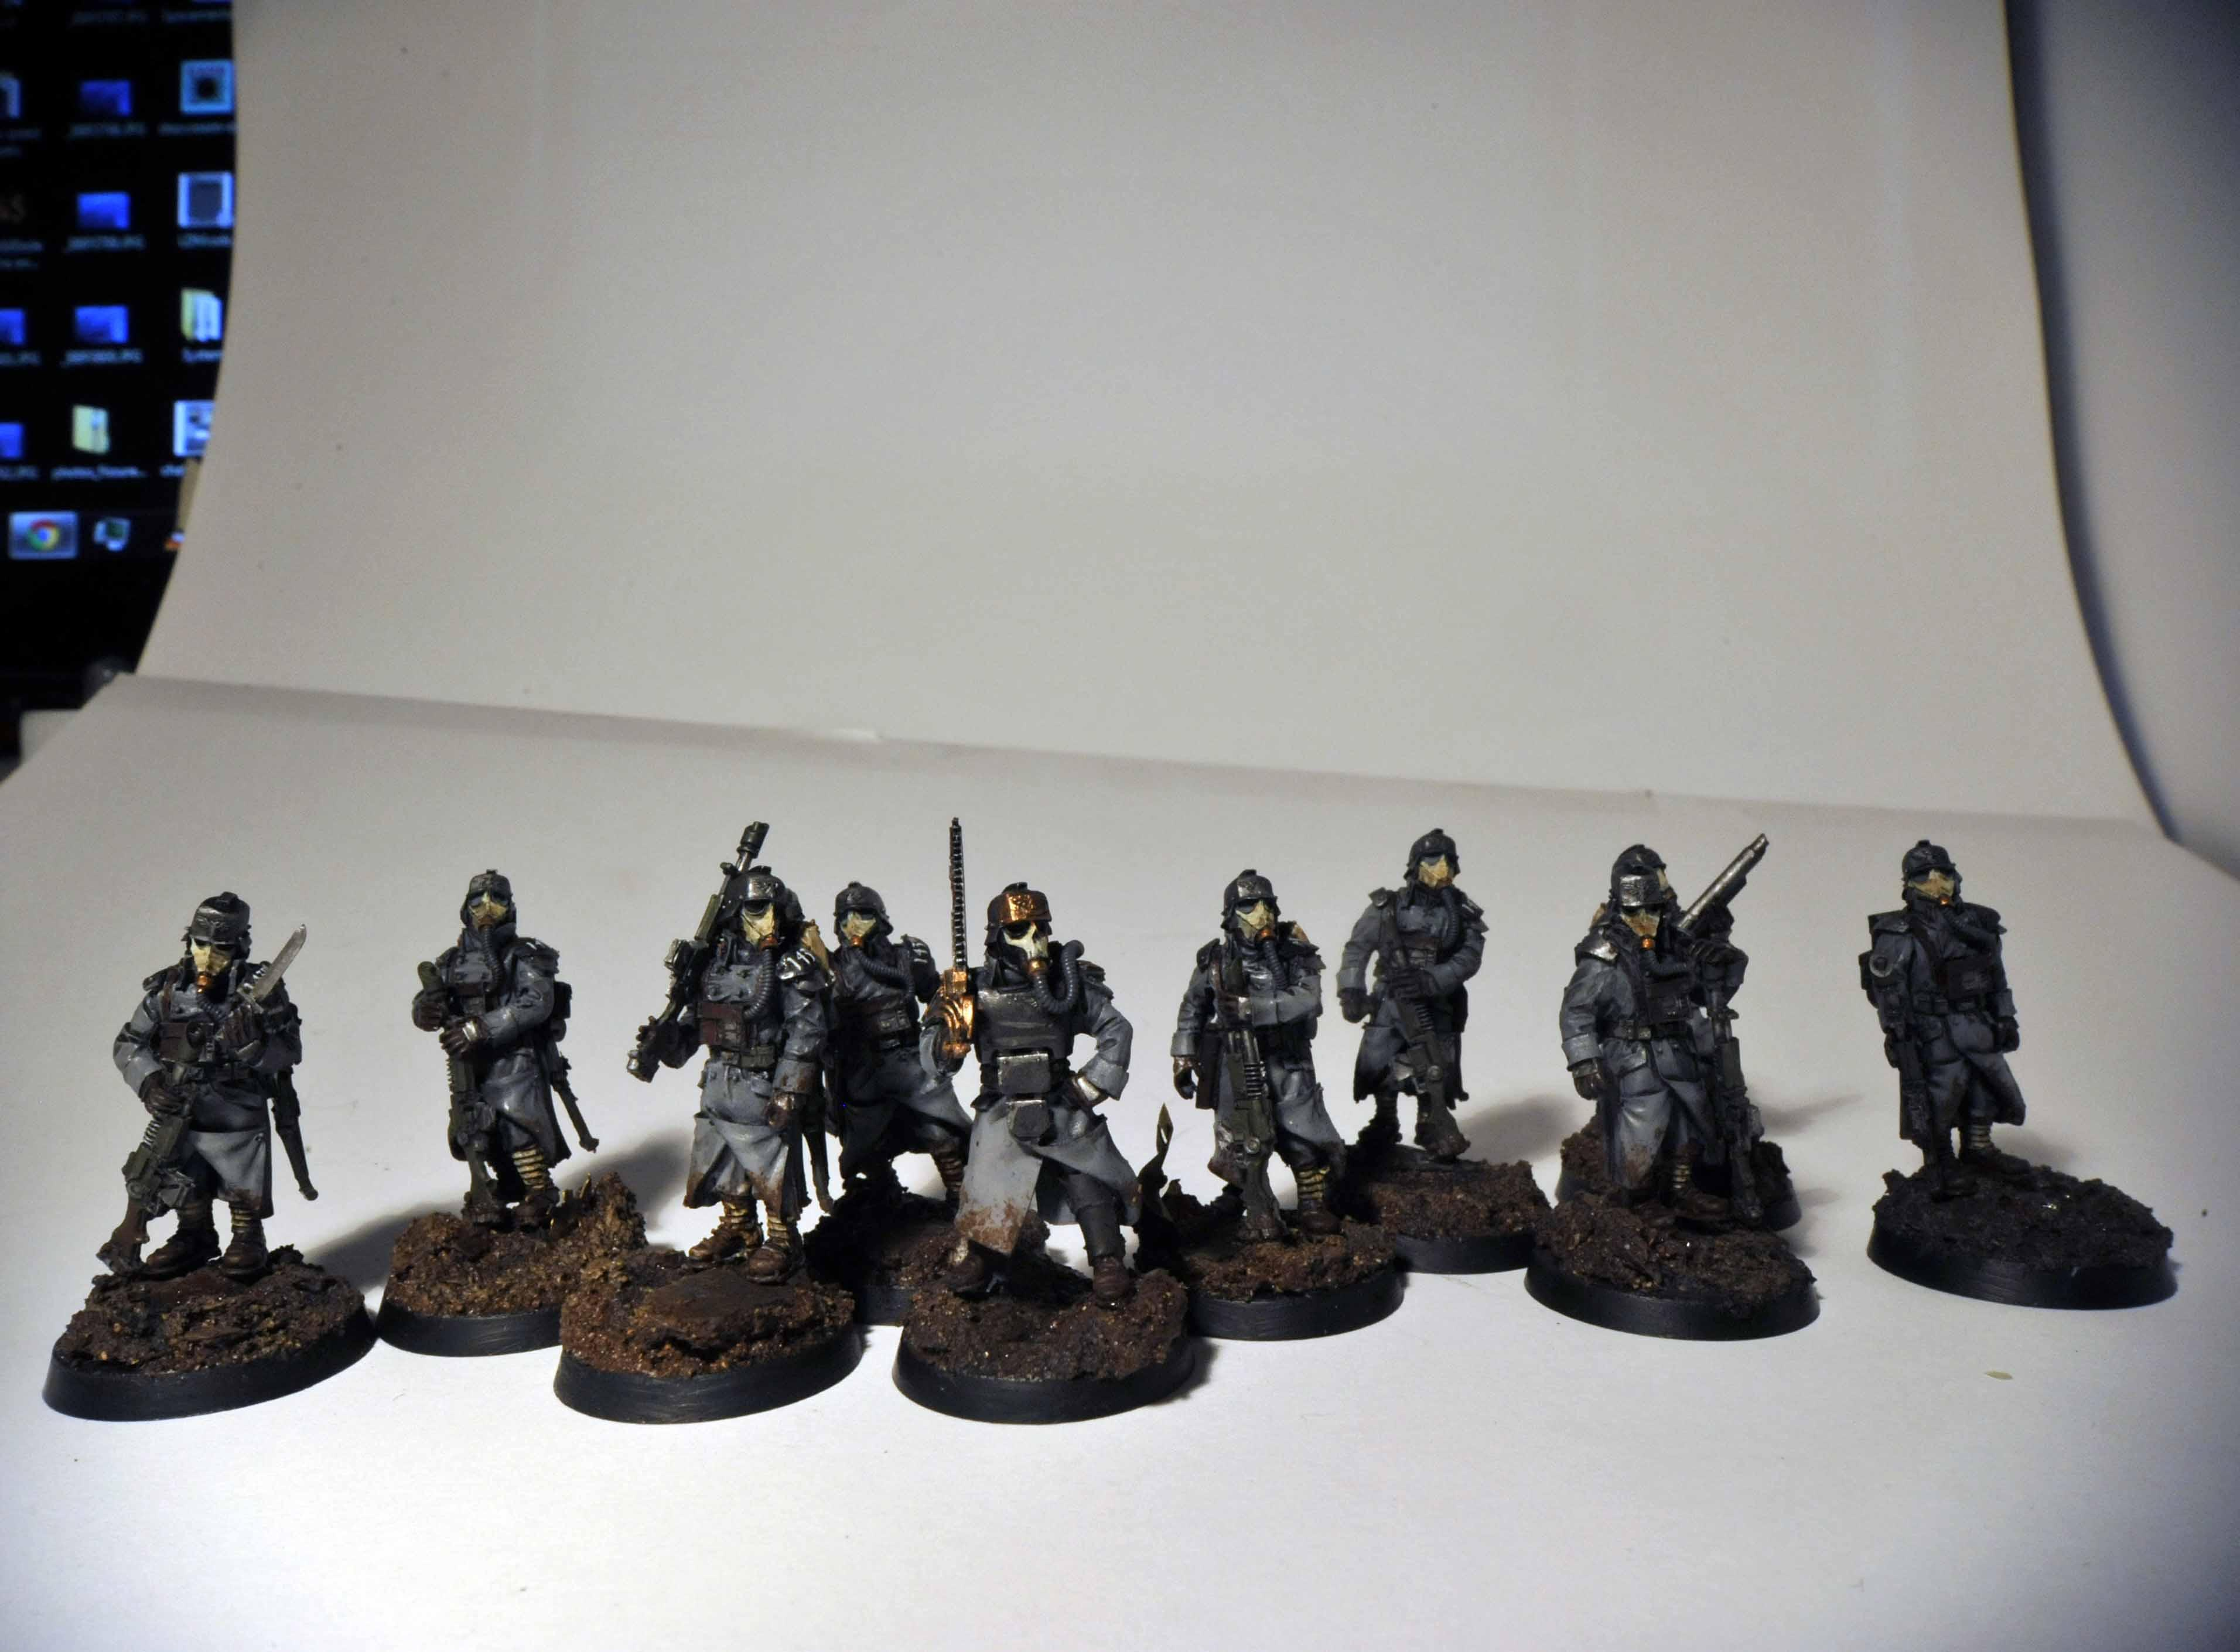 Death, Death Korps of Krieg, Forge, Forge World, Imperial, Infantry Squad, Korps, Kreigs, World